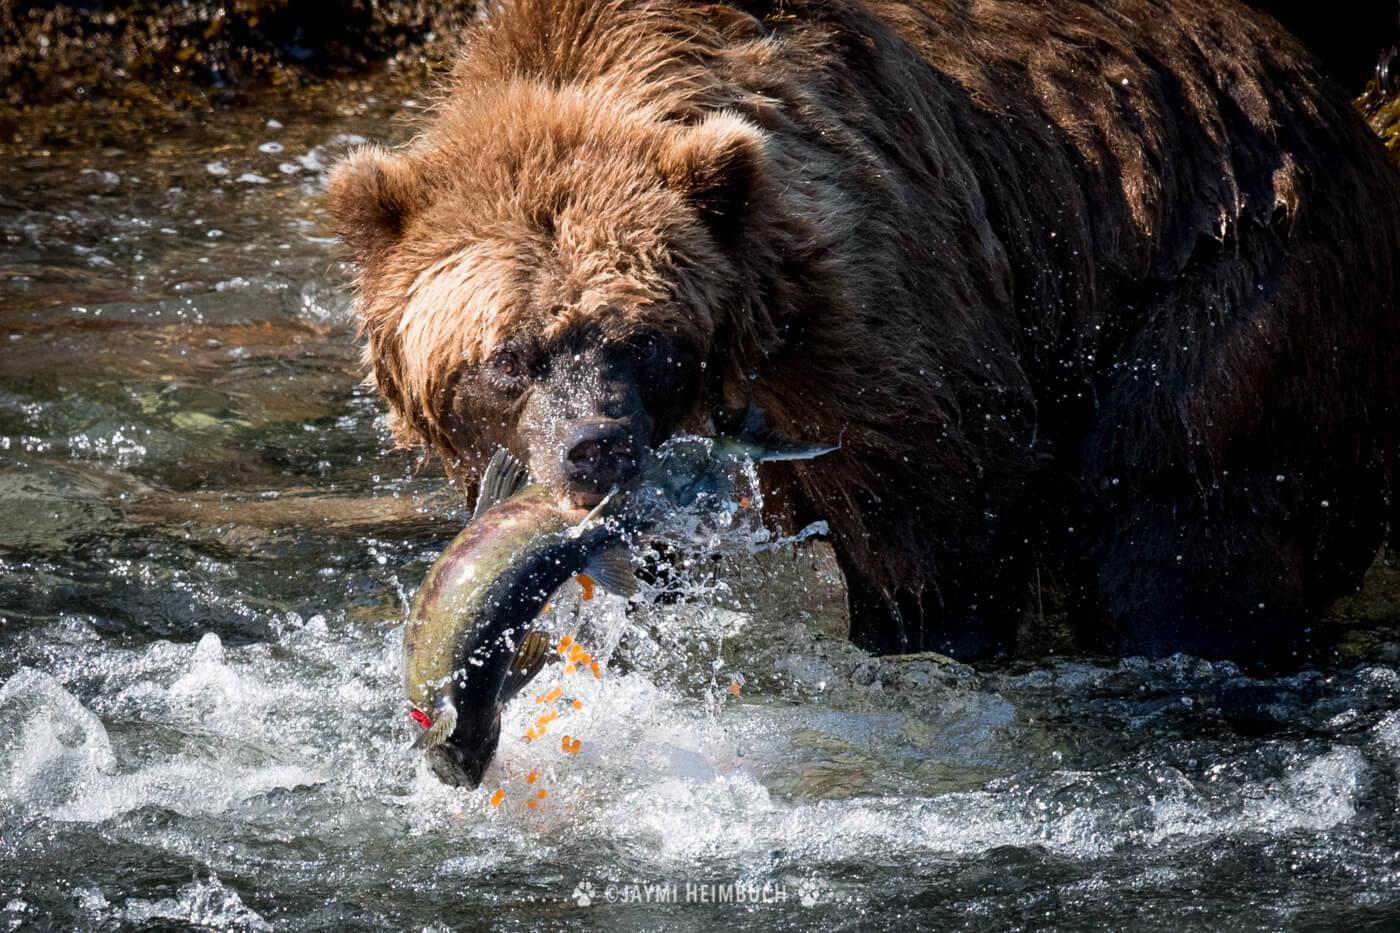 A coastal brown bear catches a gravid salmon. © Jaymi Heimbuch